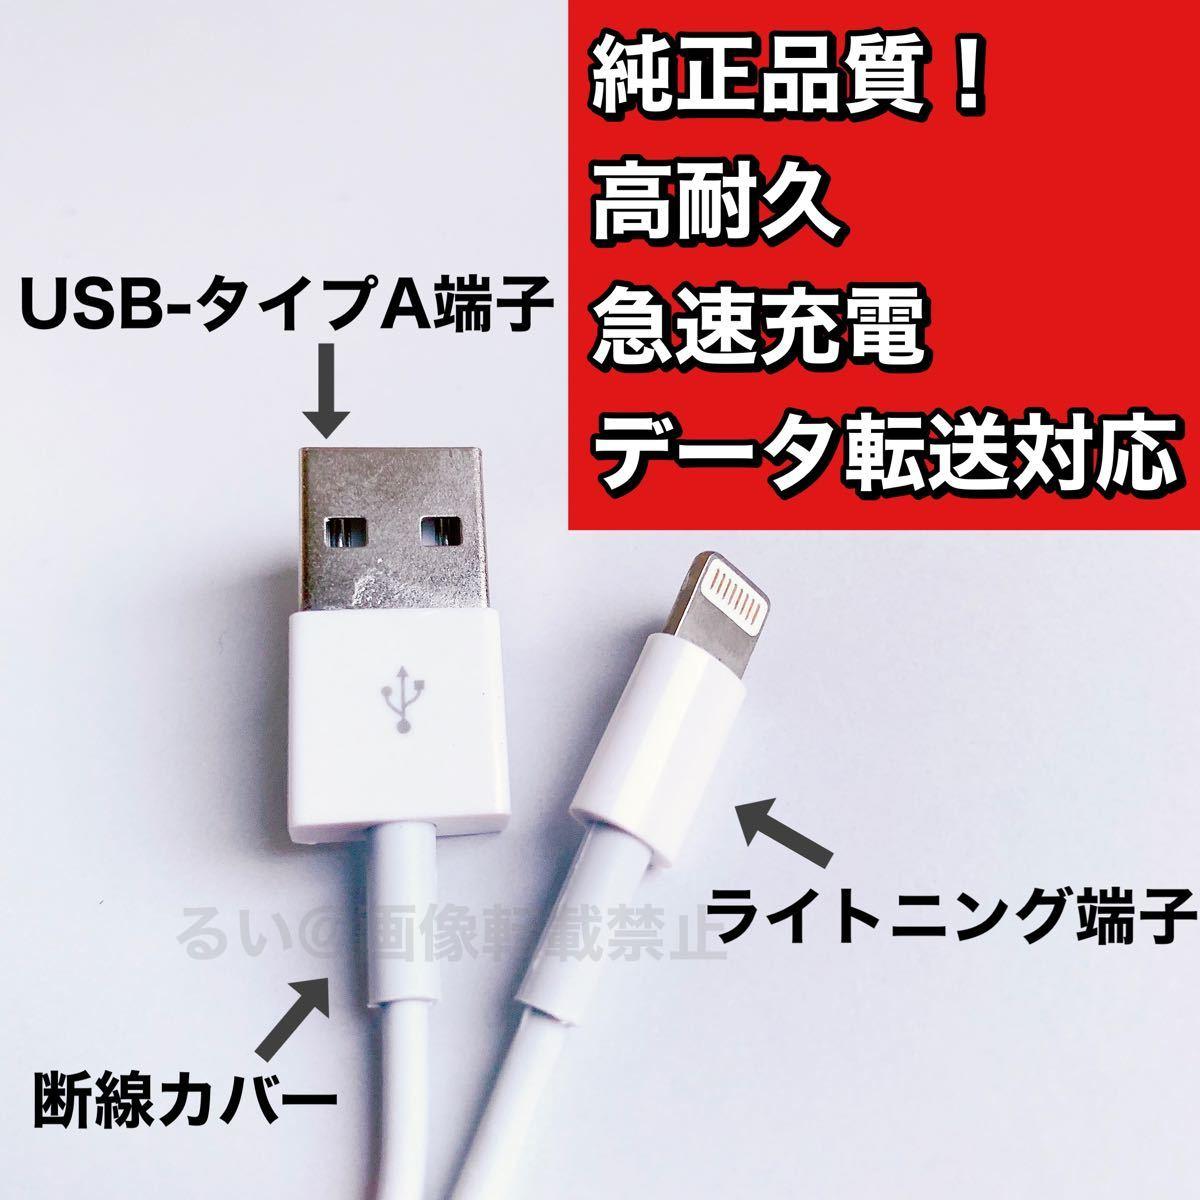 iPhone充電器 ライトニングケーブル iPhone7 iPhone X アップル